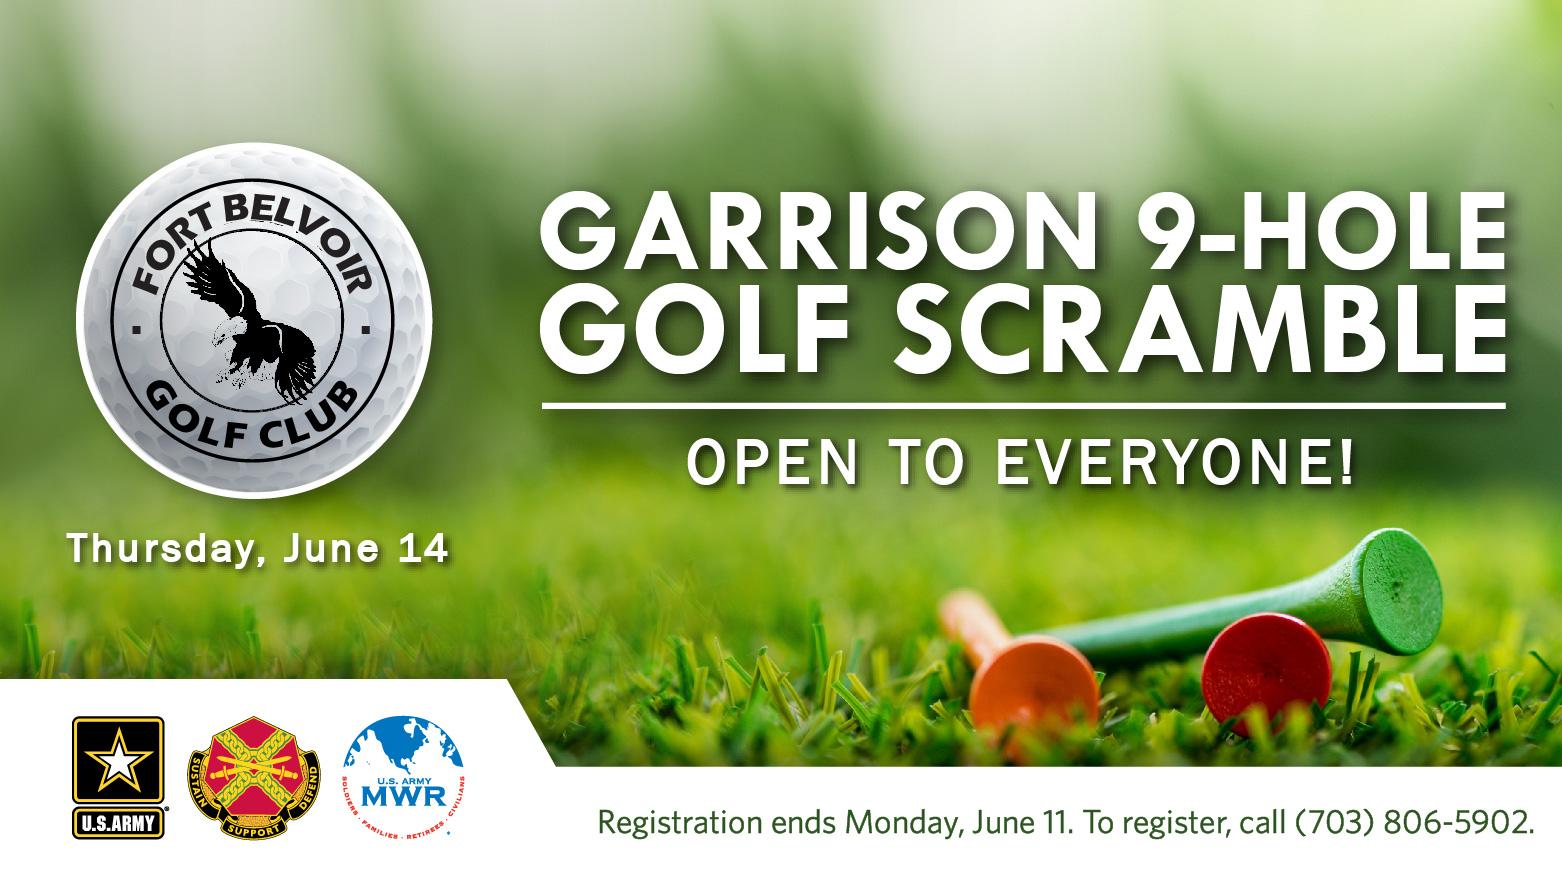 Garrison 9-Hole Golf Scramble